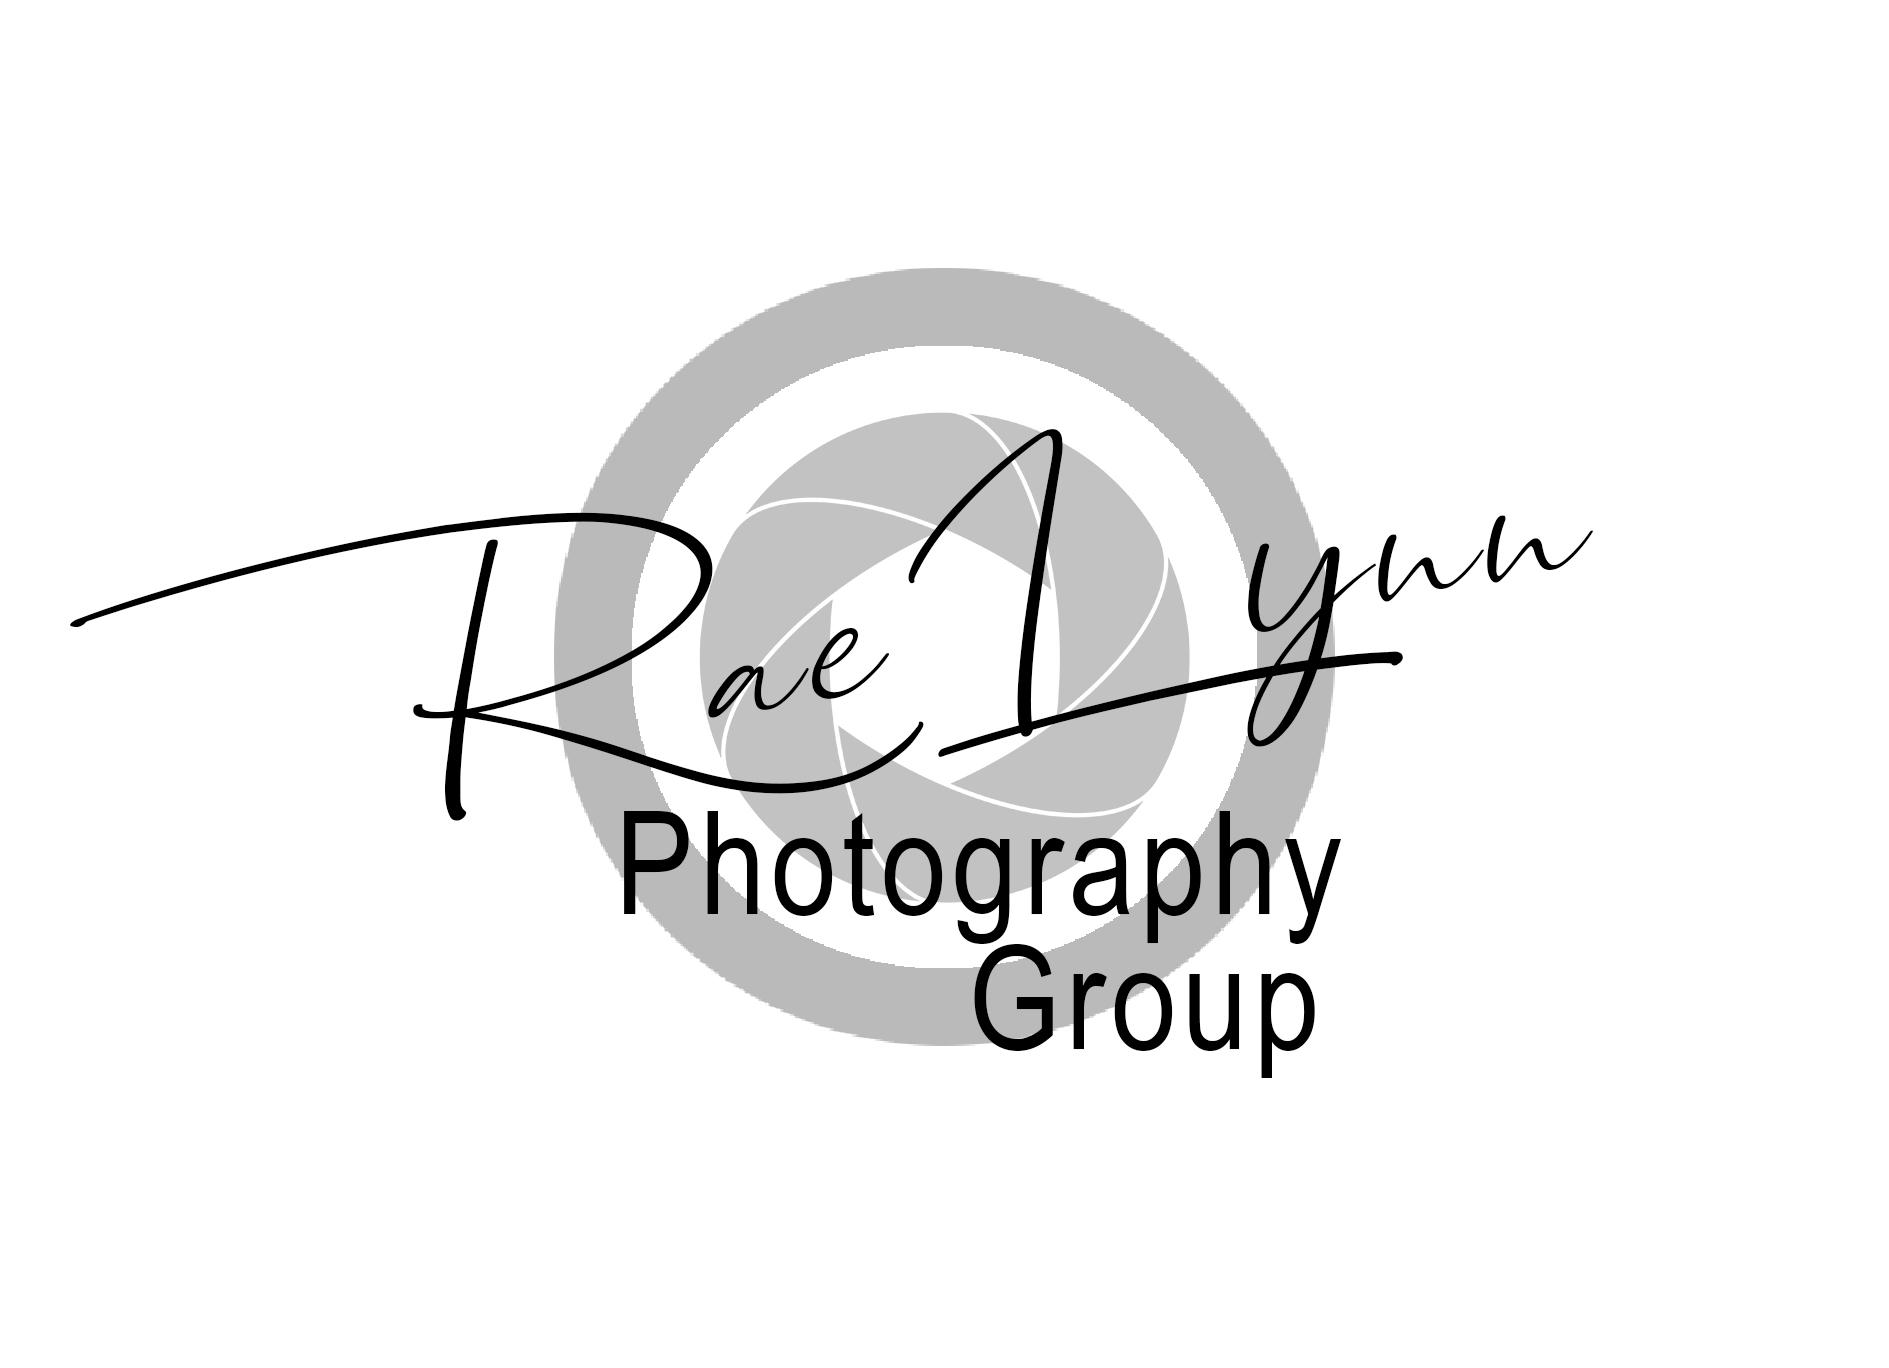 Rae Lynn Photography Group